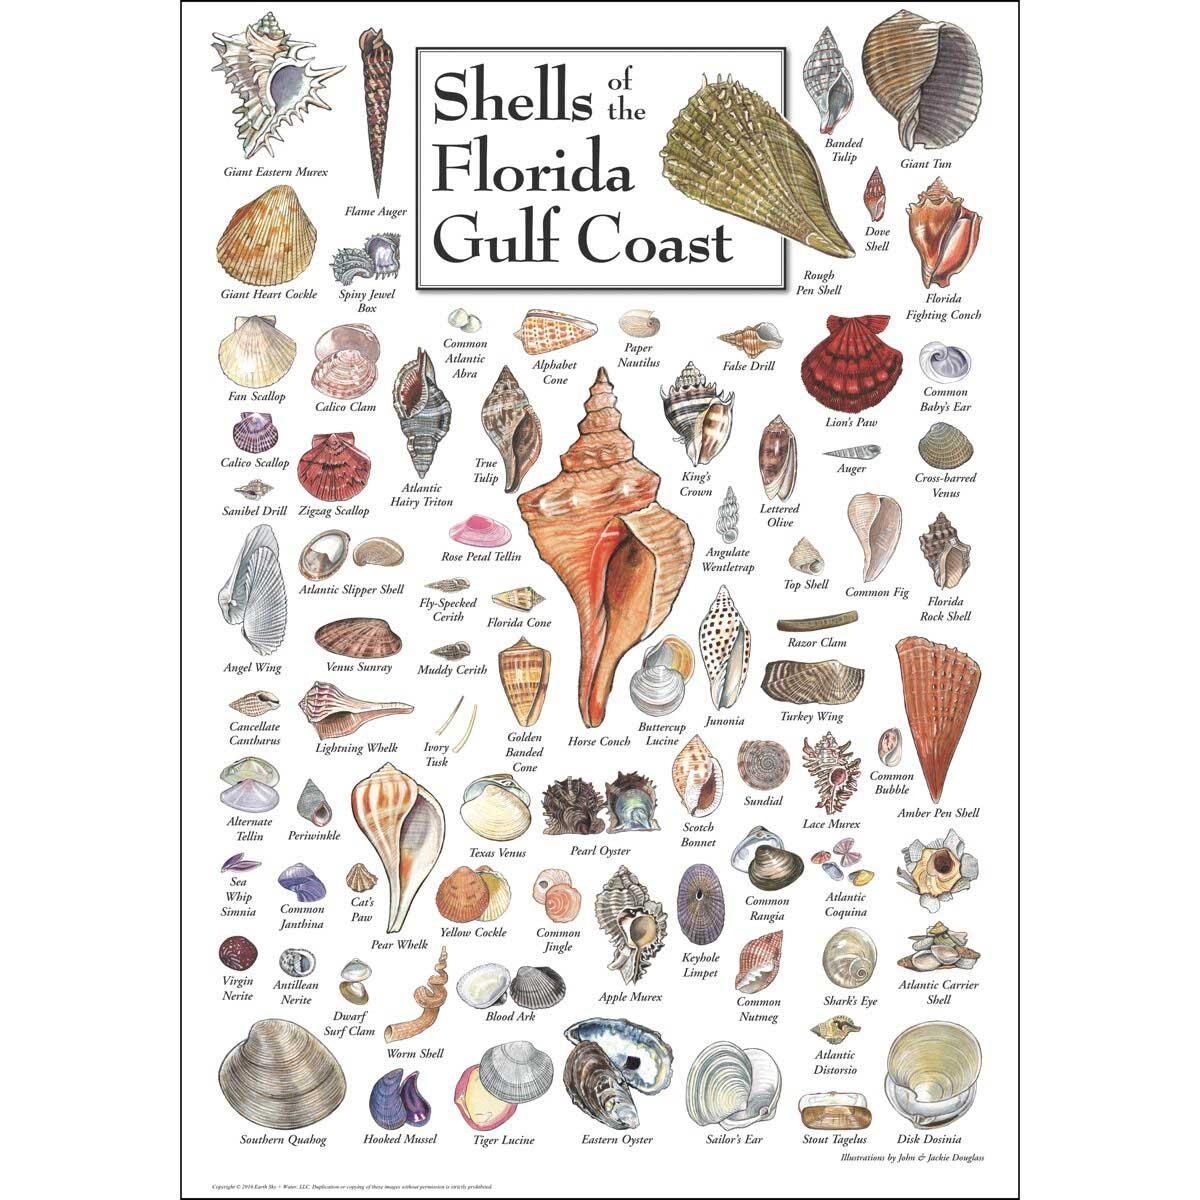 Shells of the Florida Gulf Coast Under The Sea Jigsaw Puzzle